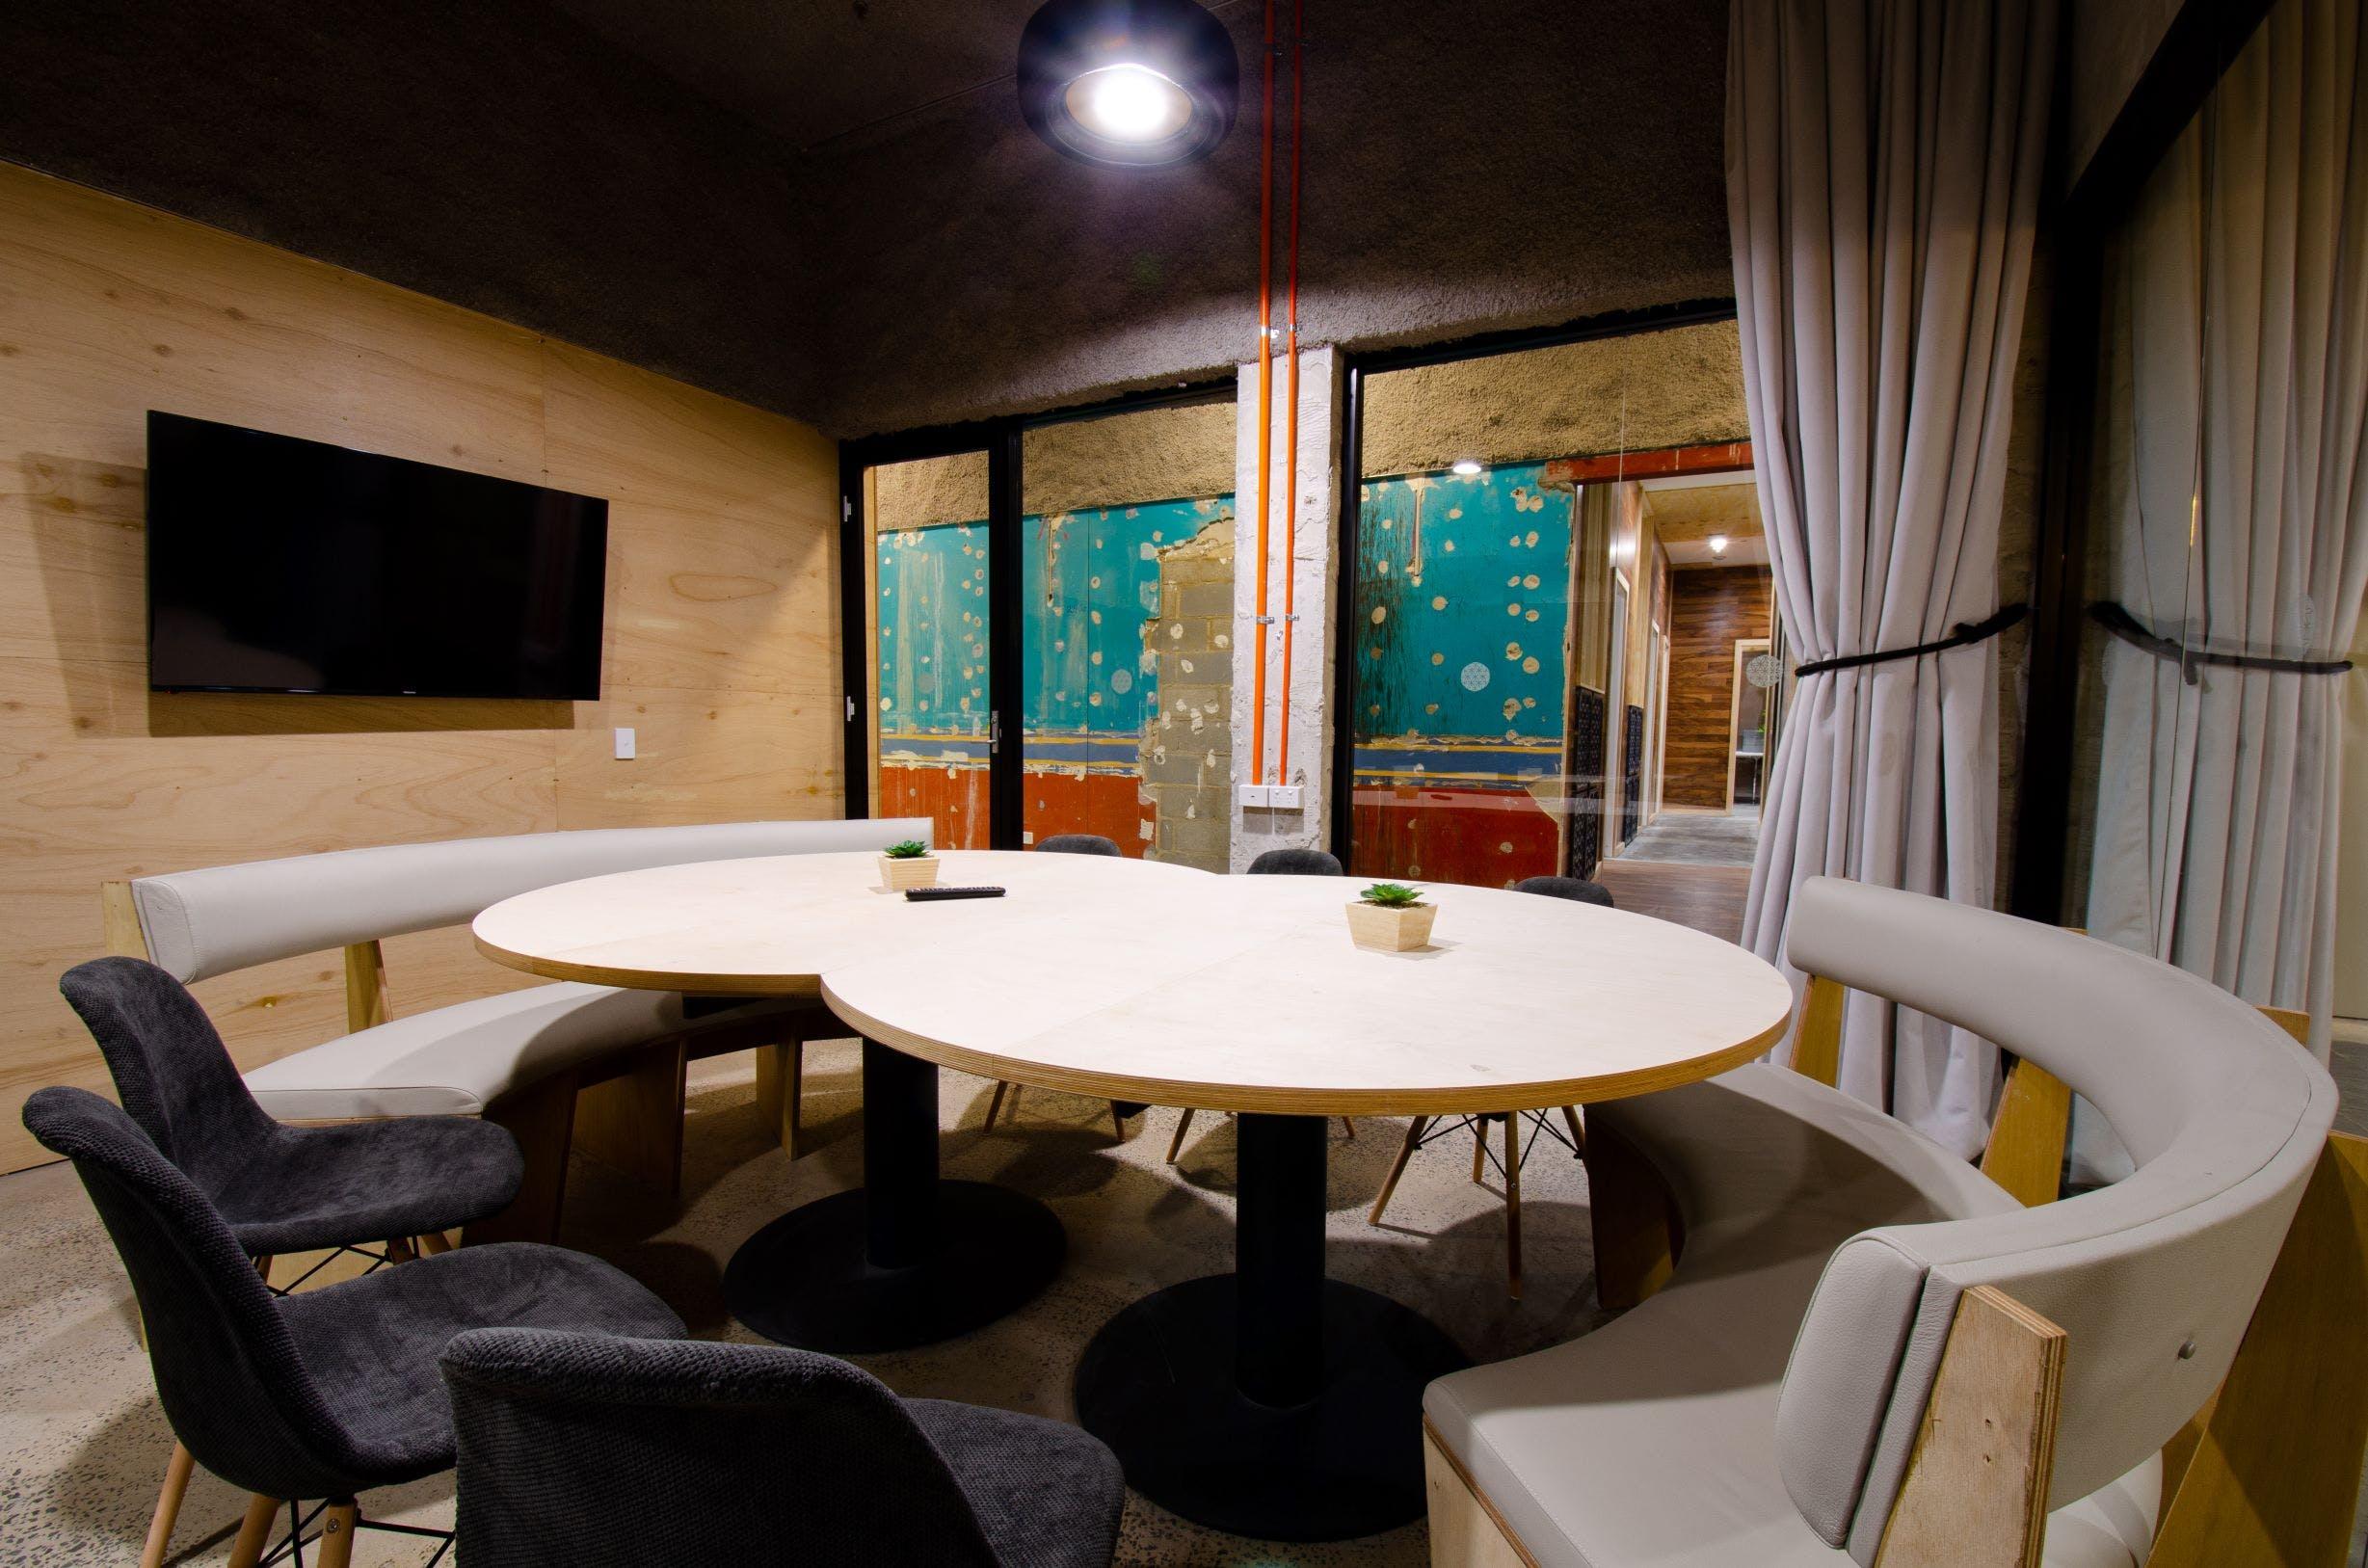 MacKenzie's Room, meeting room at WOTSO WorkSpace Bondi, image 1